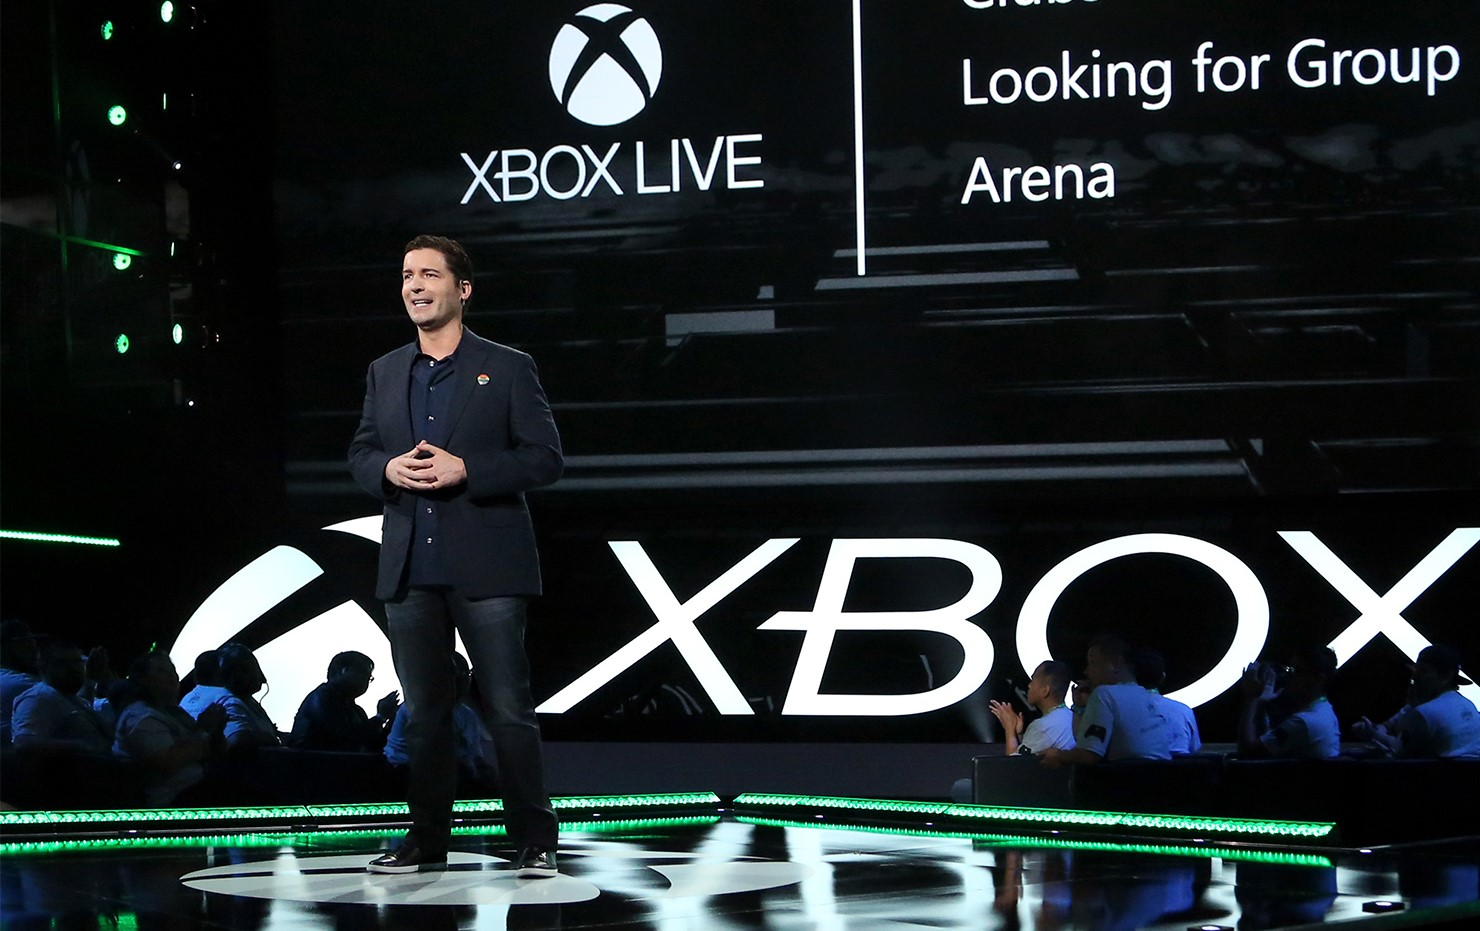 Mike Ybarra Microsoft team Xbox e gaming